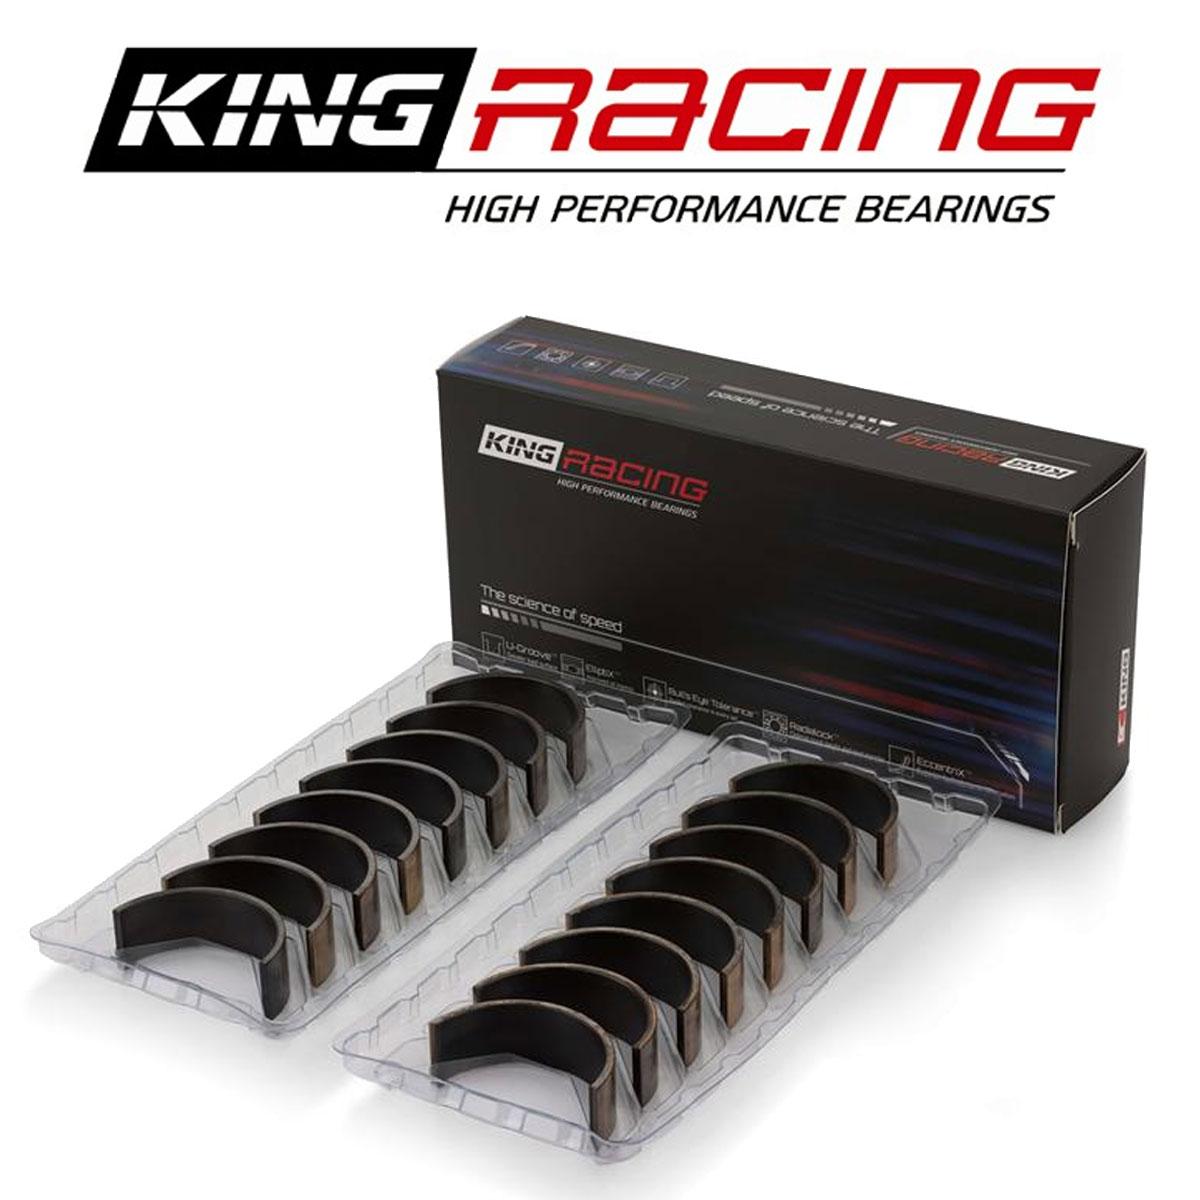 King Race Rod Bearings for Subaru EJ20 EJ22 EJ25 Impreza WRX STI CR4125XPGSTDX